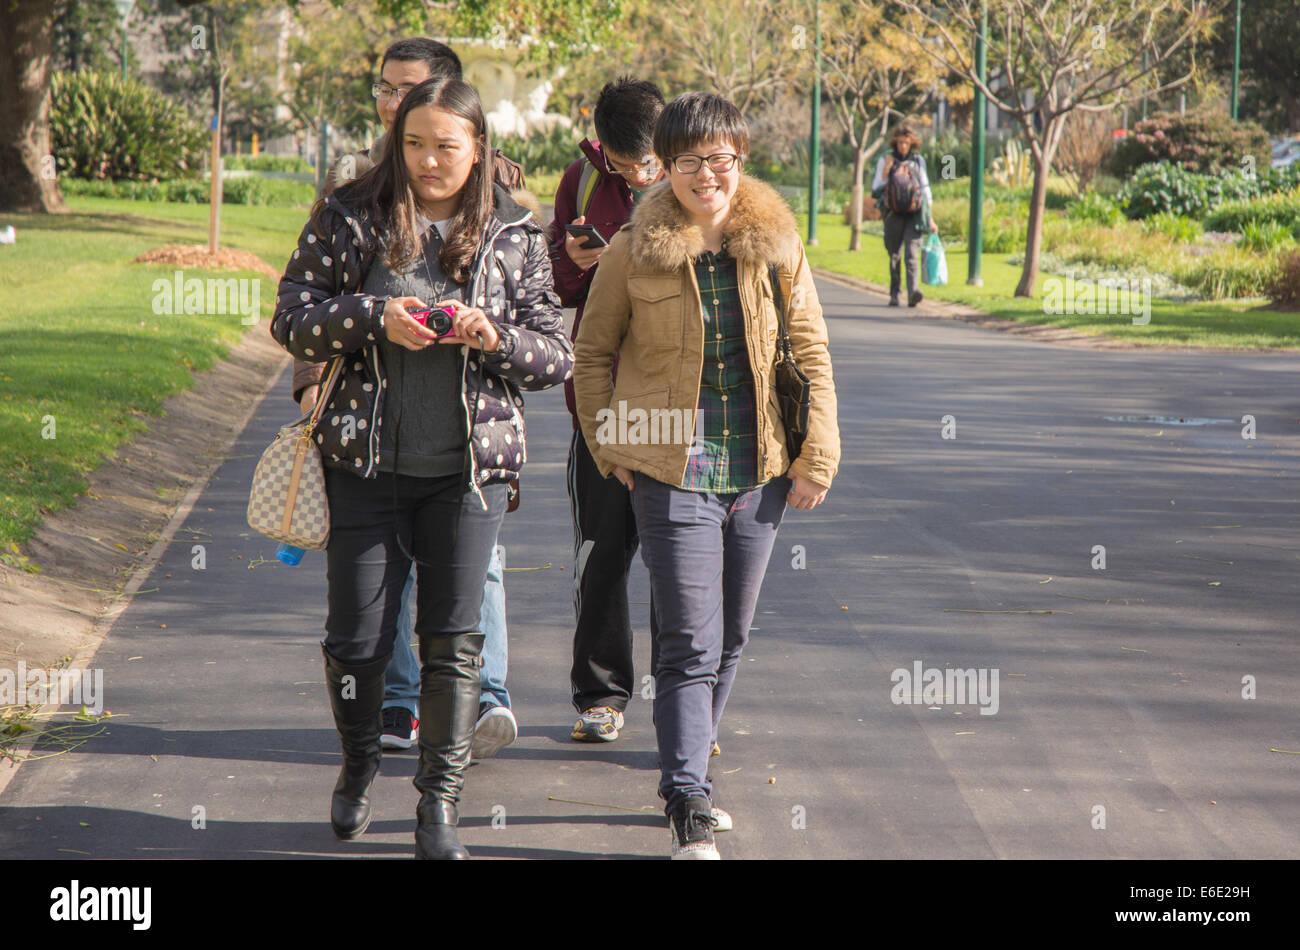 Pedestrians - Stock Image